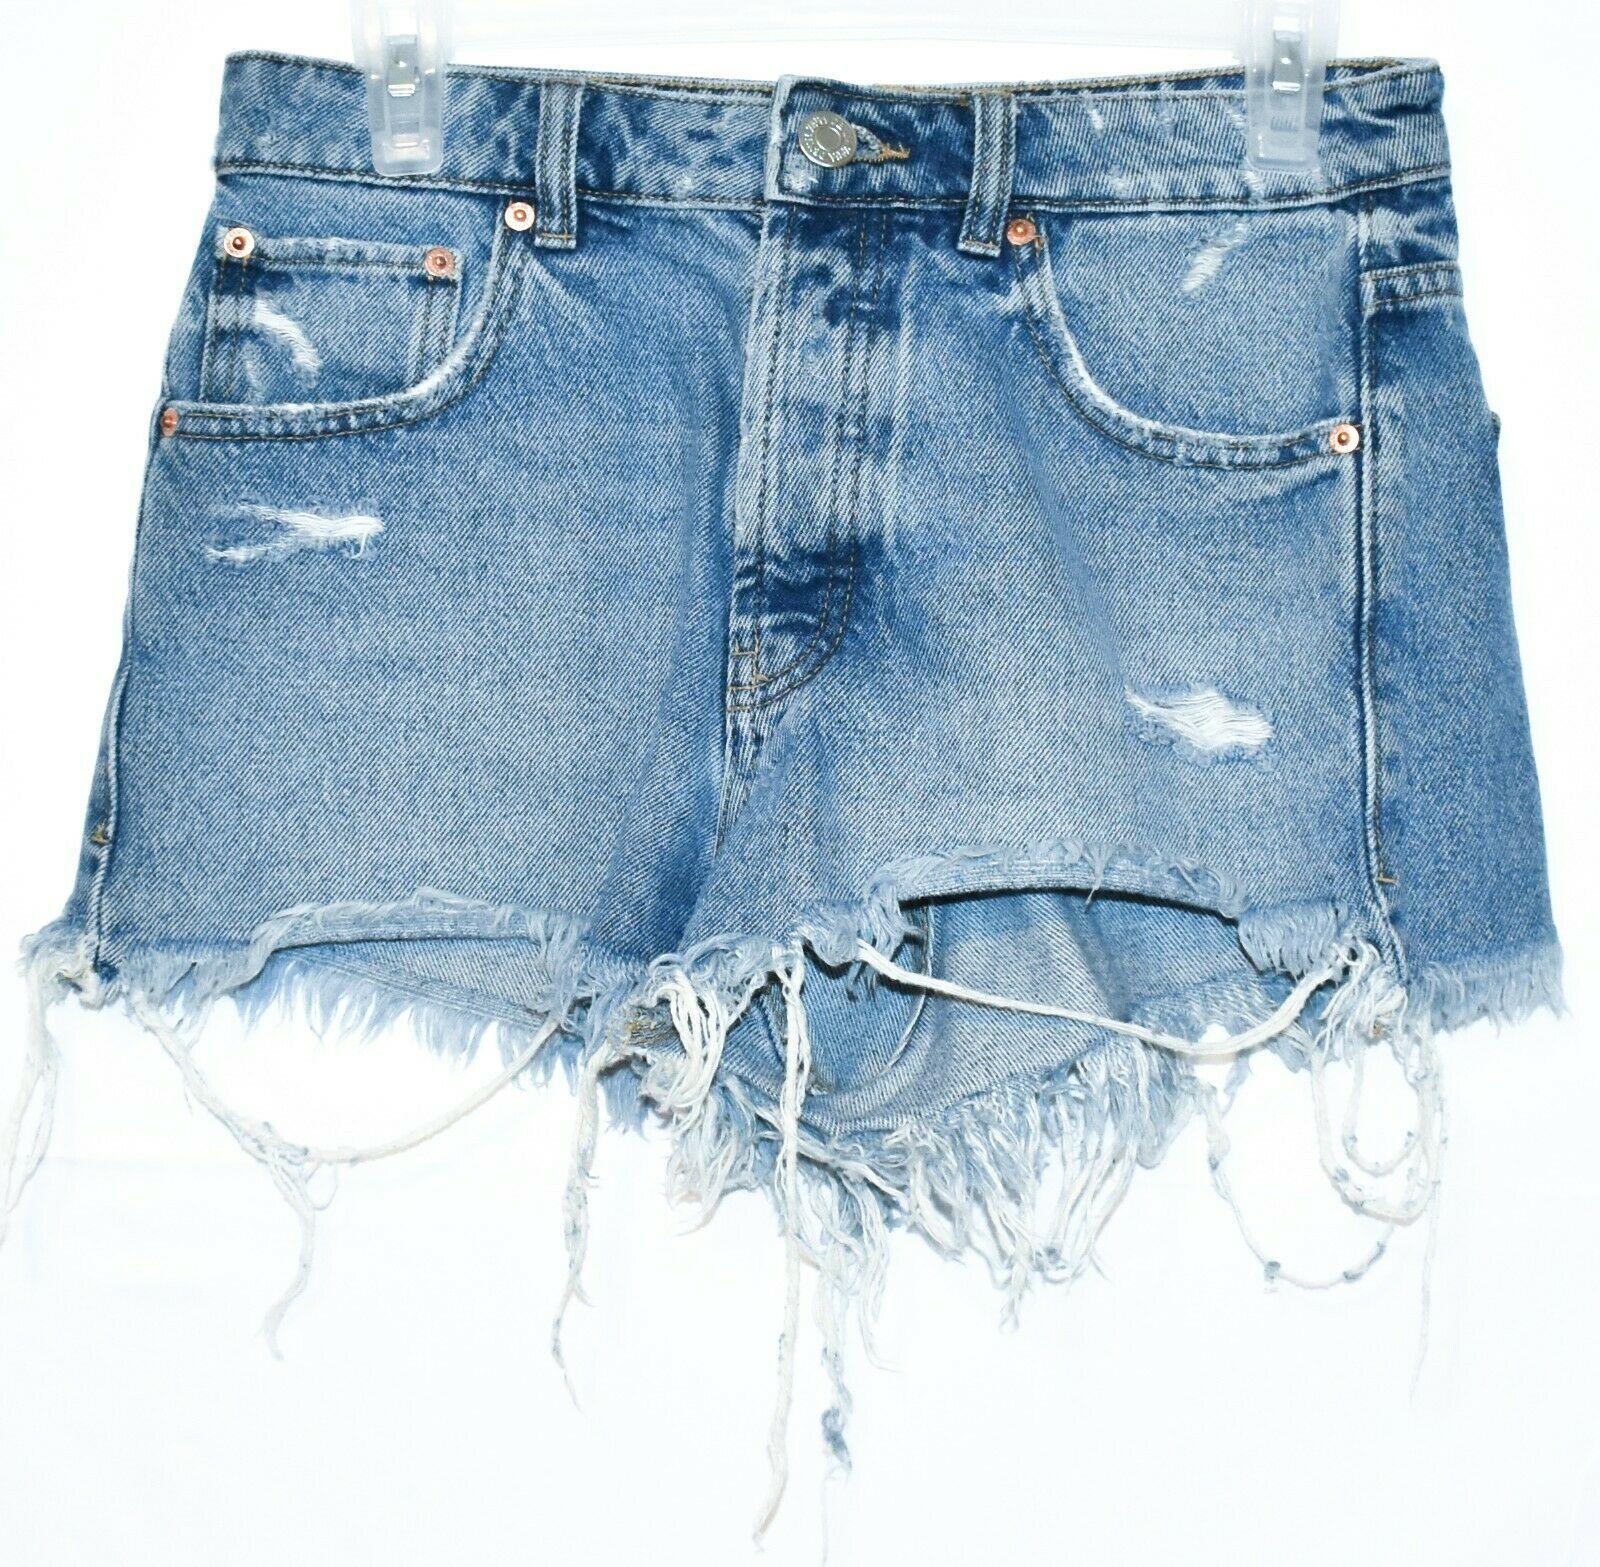 Zara Women's Tattered Raw Hem Distressed Blue Denim Button Up Jean Shorts Size 4